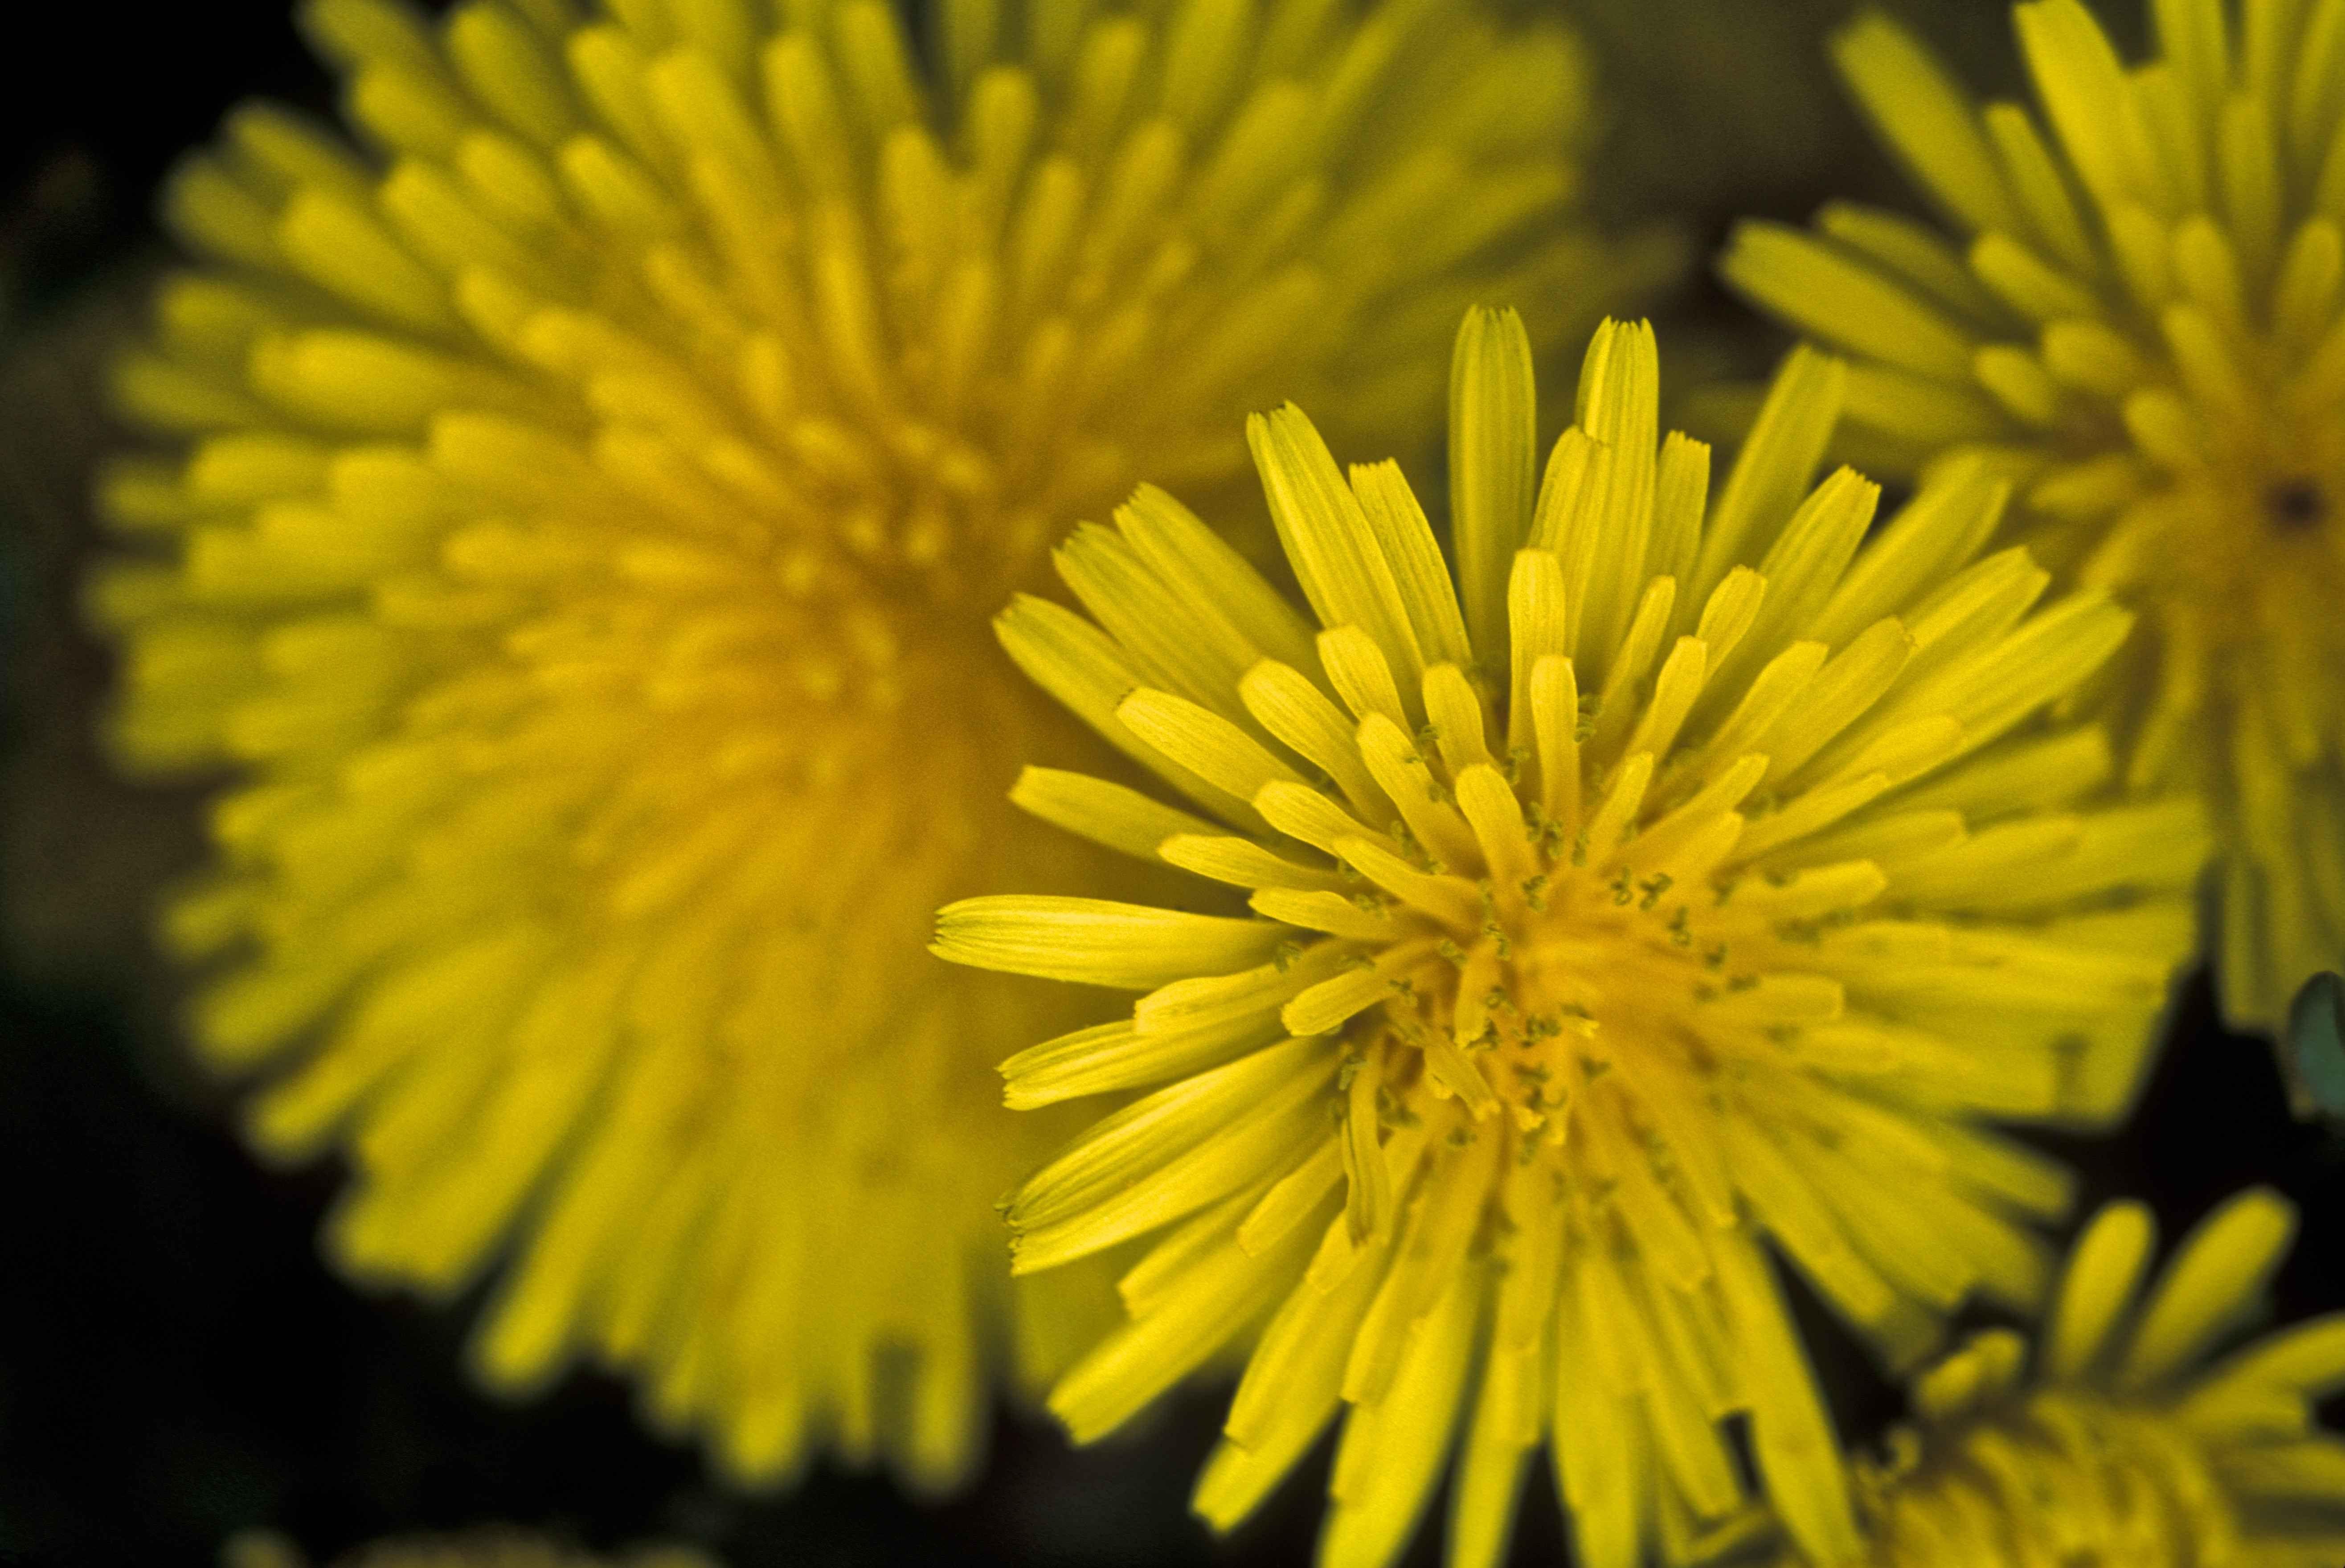 Dandelion_flower_macro_taraxacum_officinale.jpg (5263×3519)